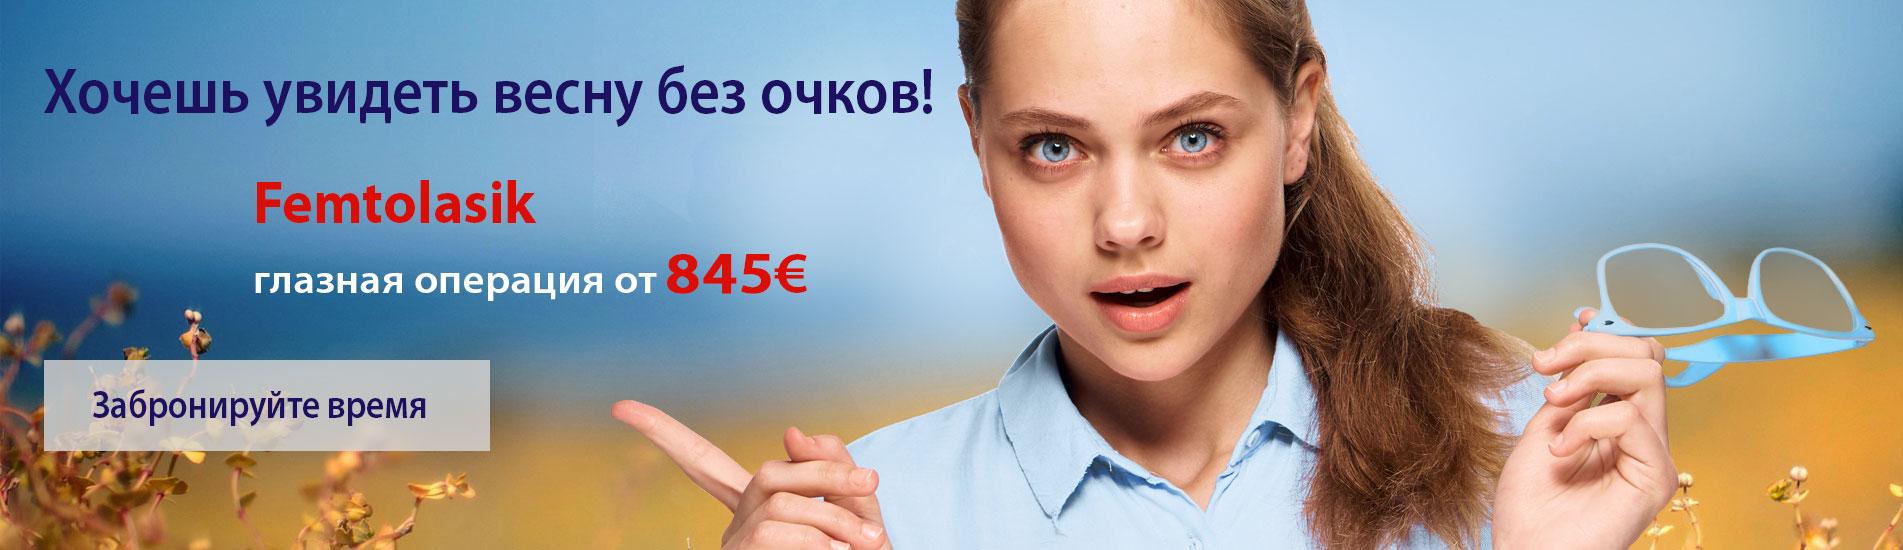 Femtolasik глазная операция от 845€